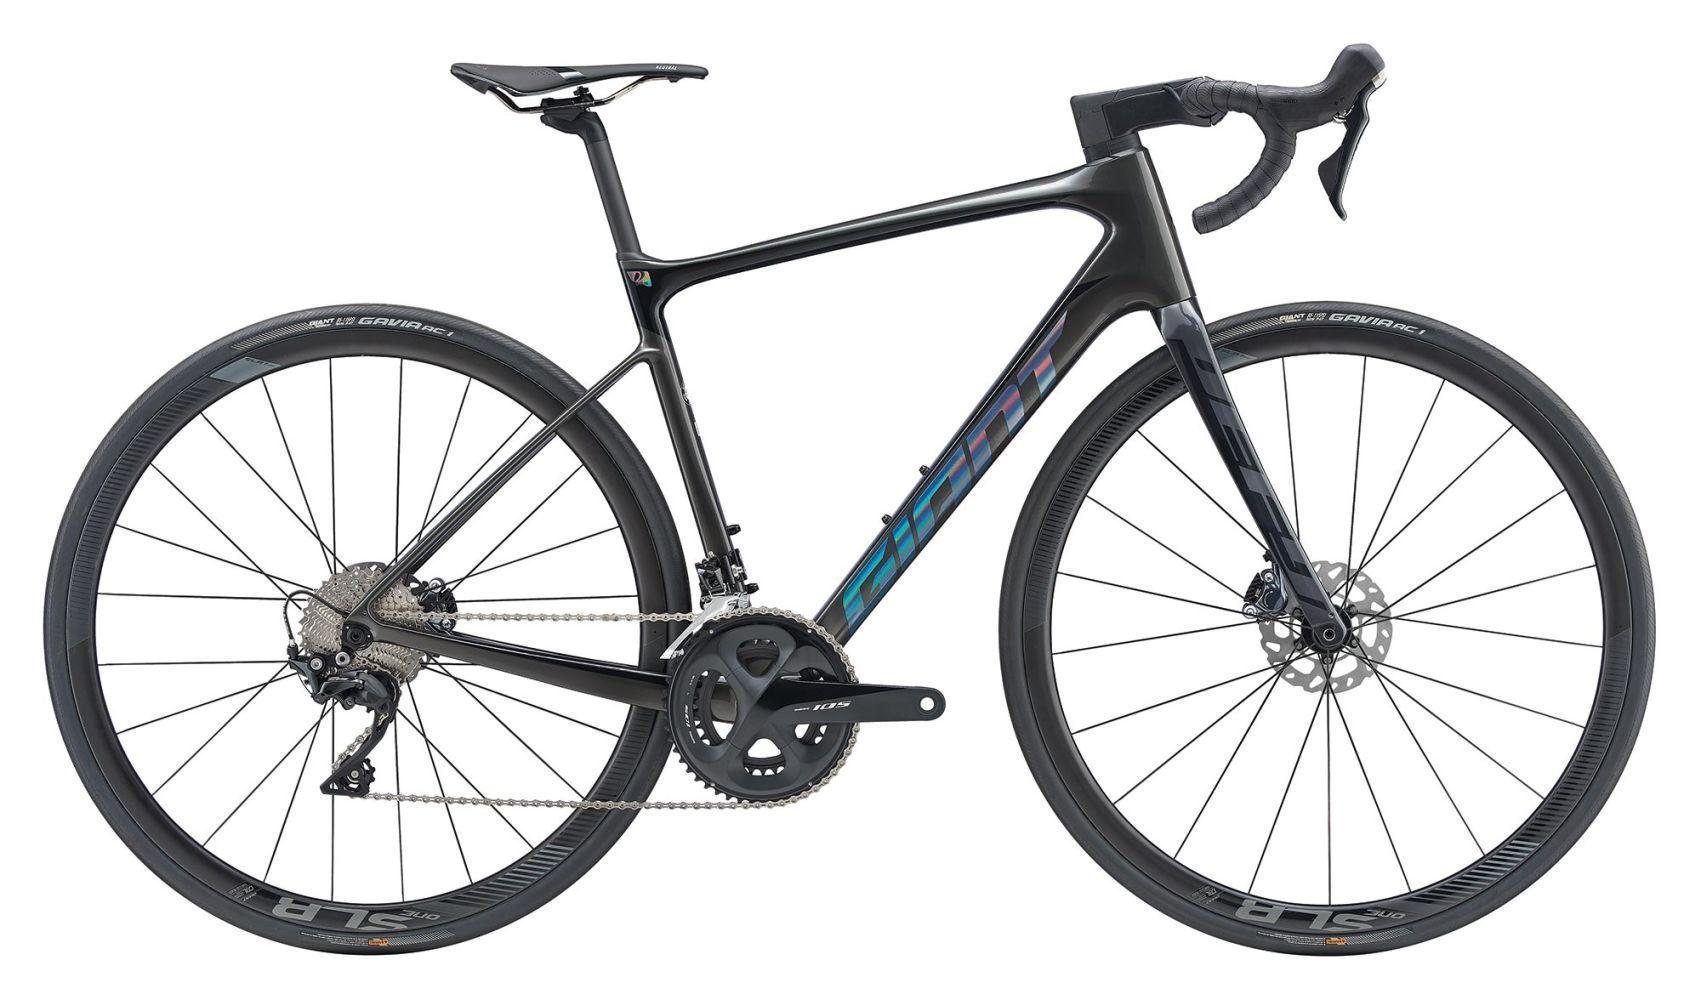 037d63e2d6 Giant Defy 2019 road bike range explained - Cycling Weekly